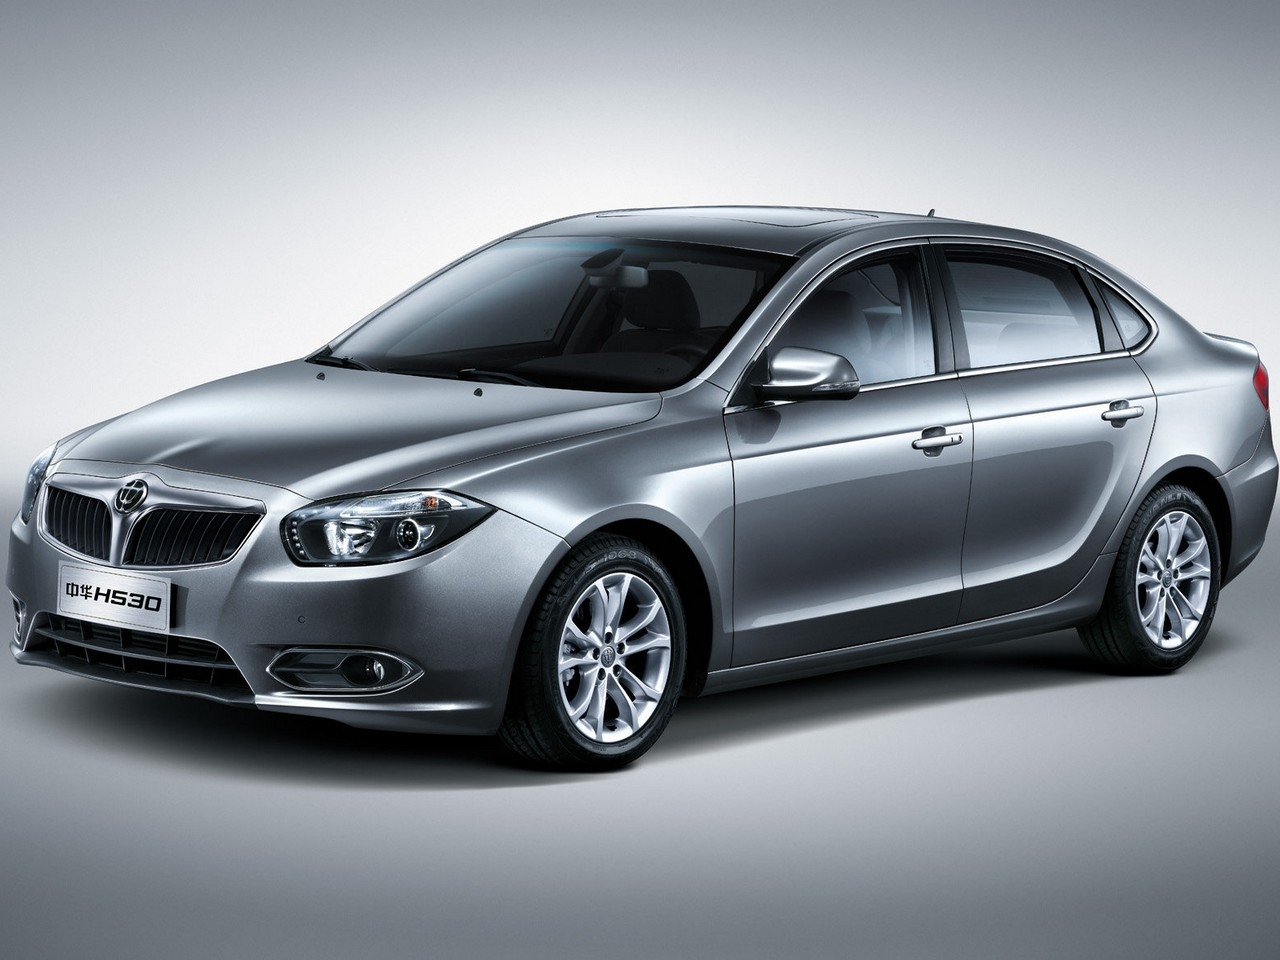 Модели автомобилей фото и названия